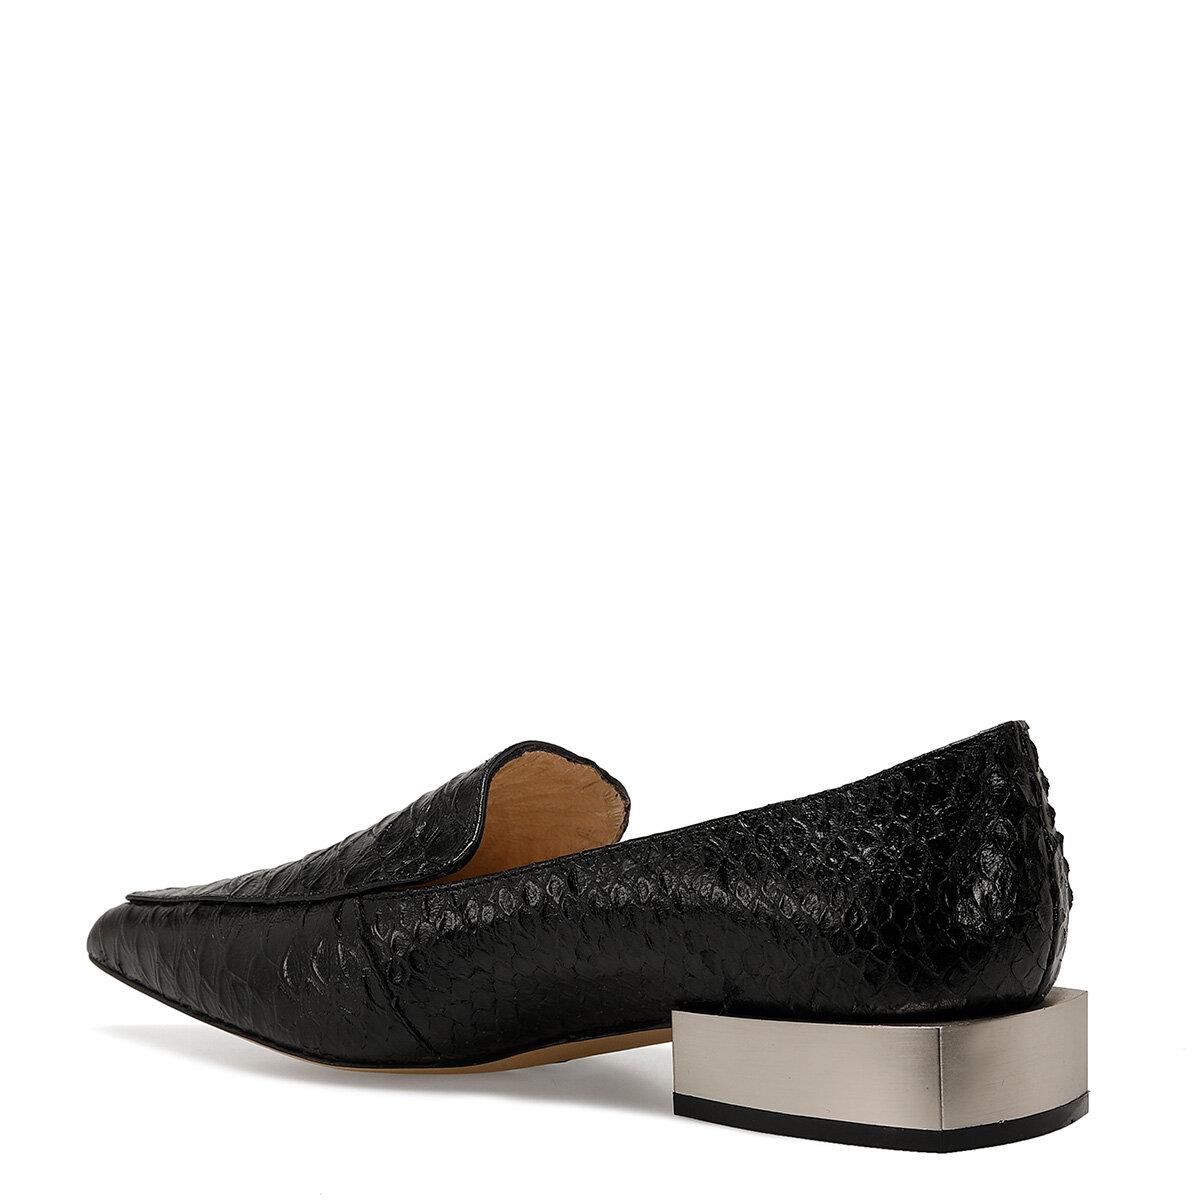 GENIE Siyah Kadın Loafer